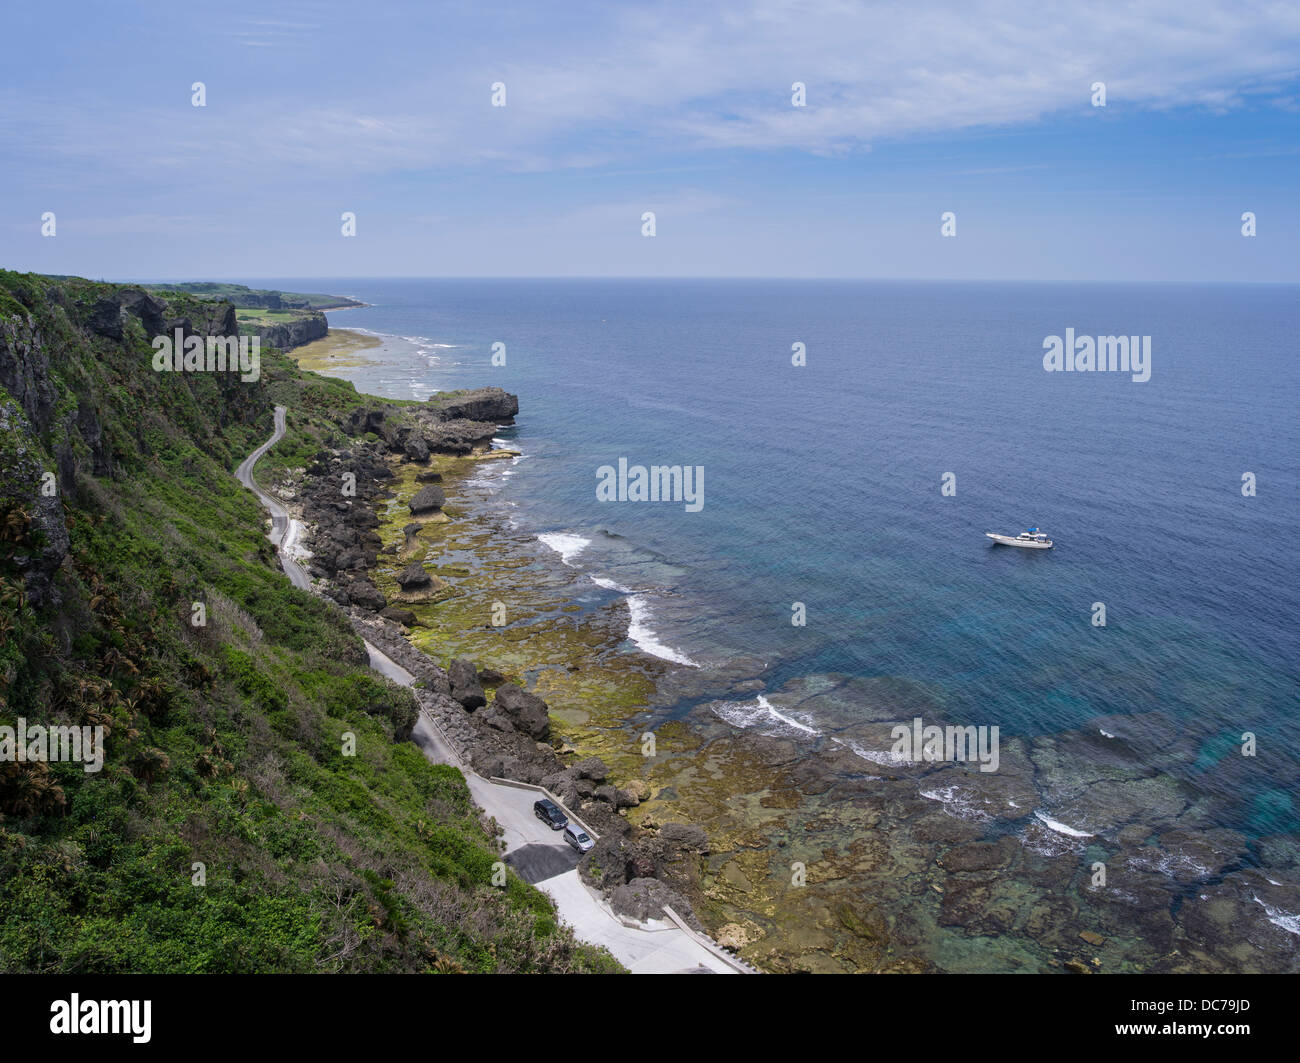 Wajee Viewpoint, Ie Island, Okinawa, Japan Stock Photo